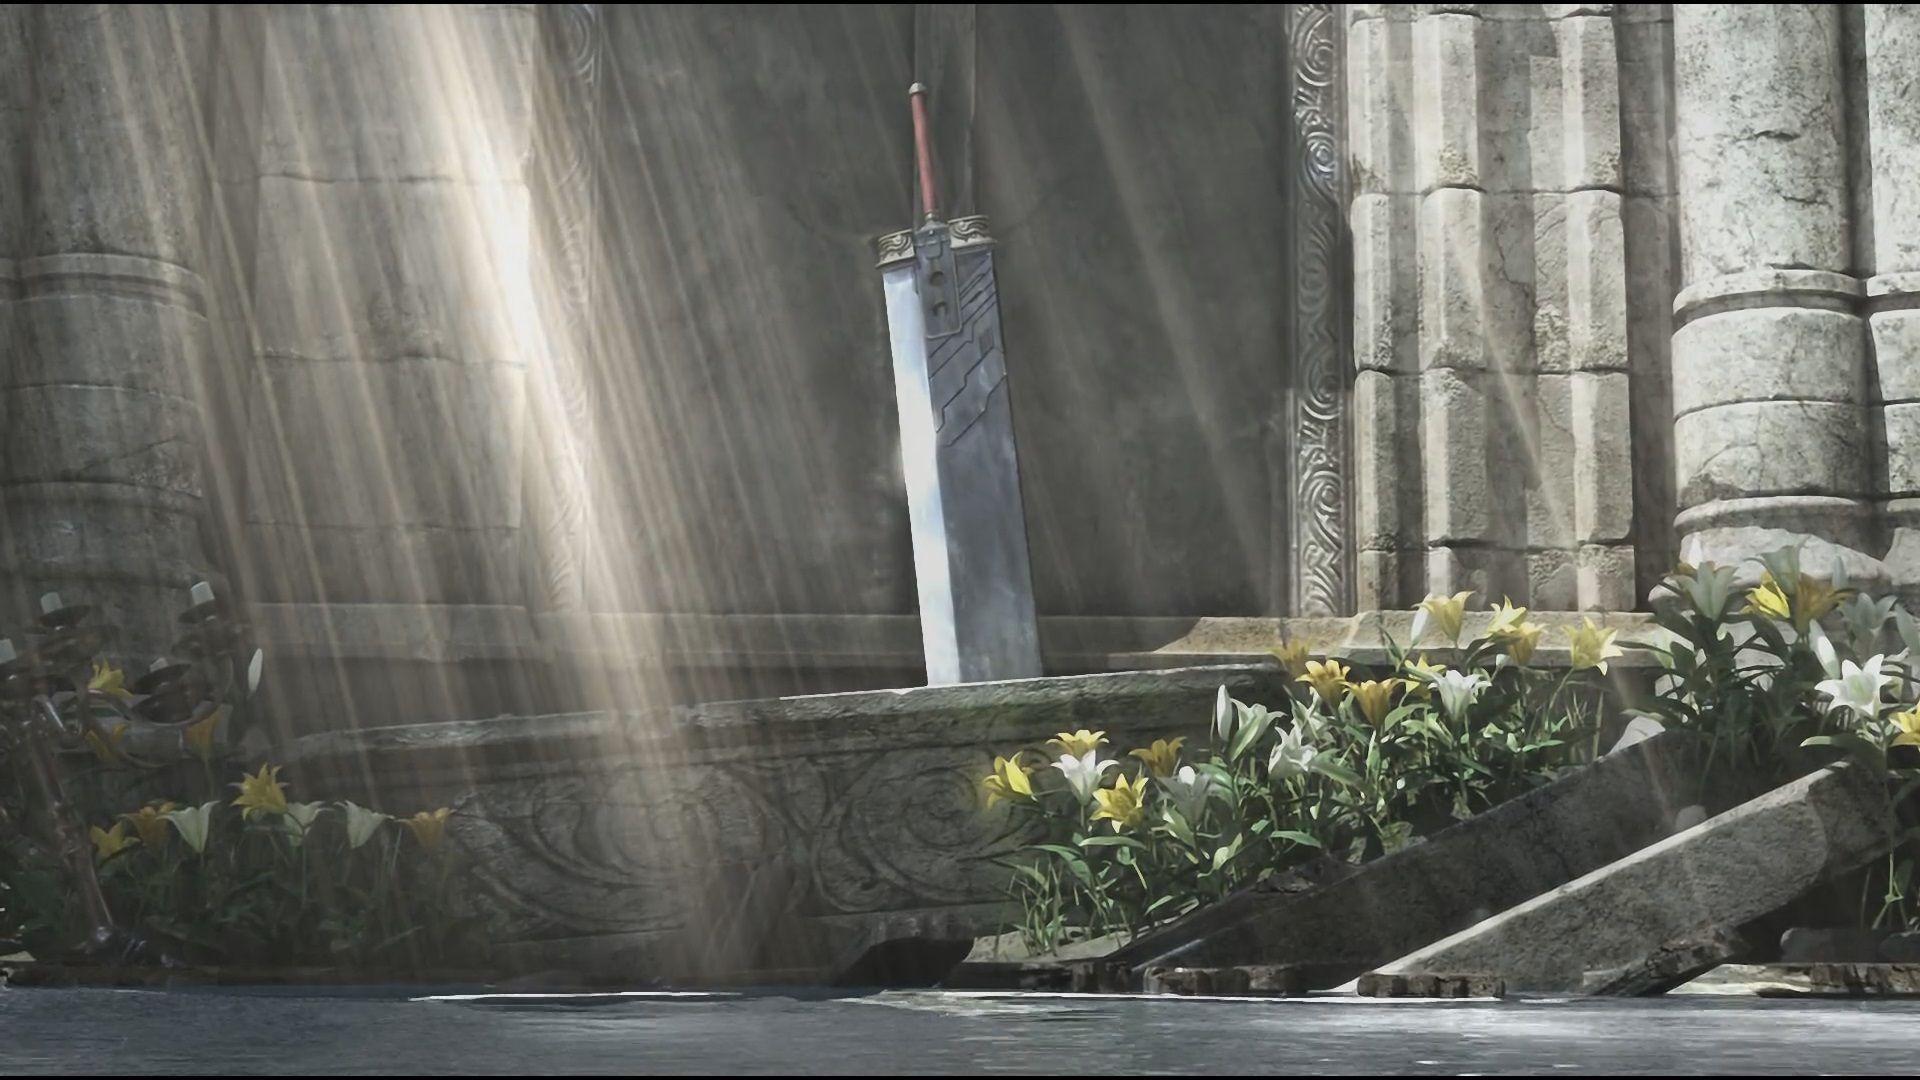 Final Fantasy Vii Advent Children Wallpaper 1 |